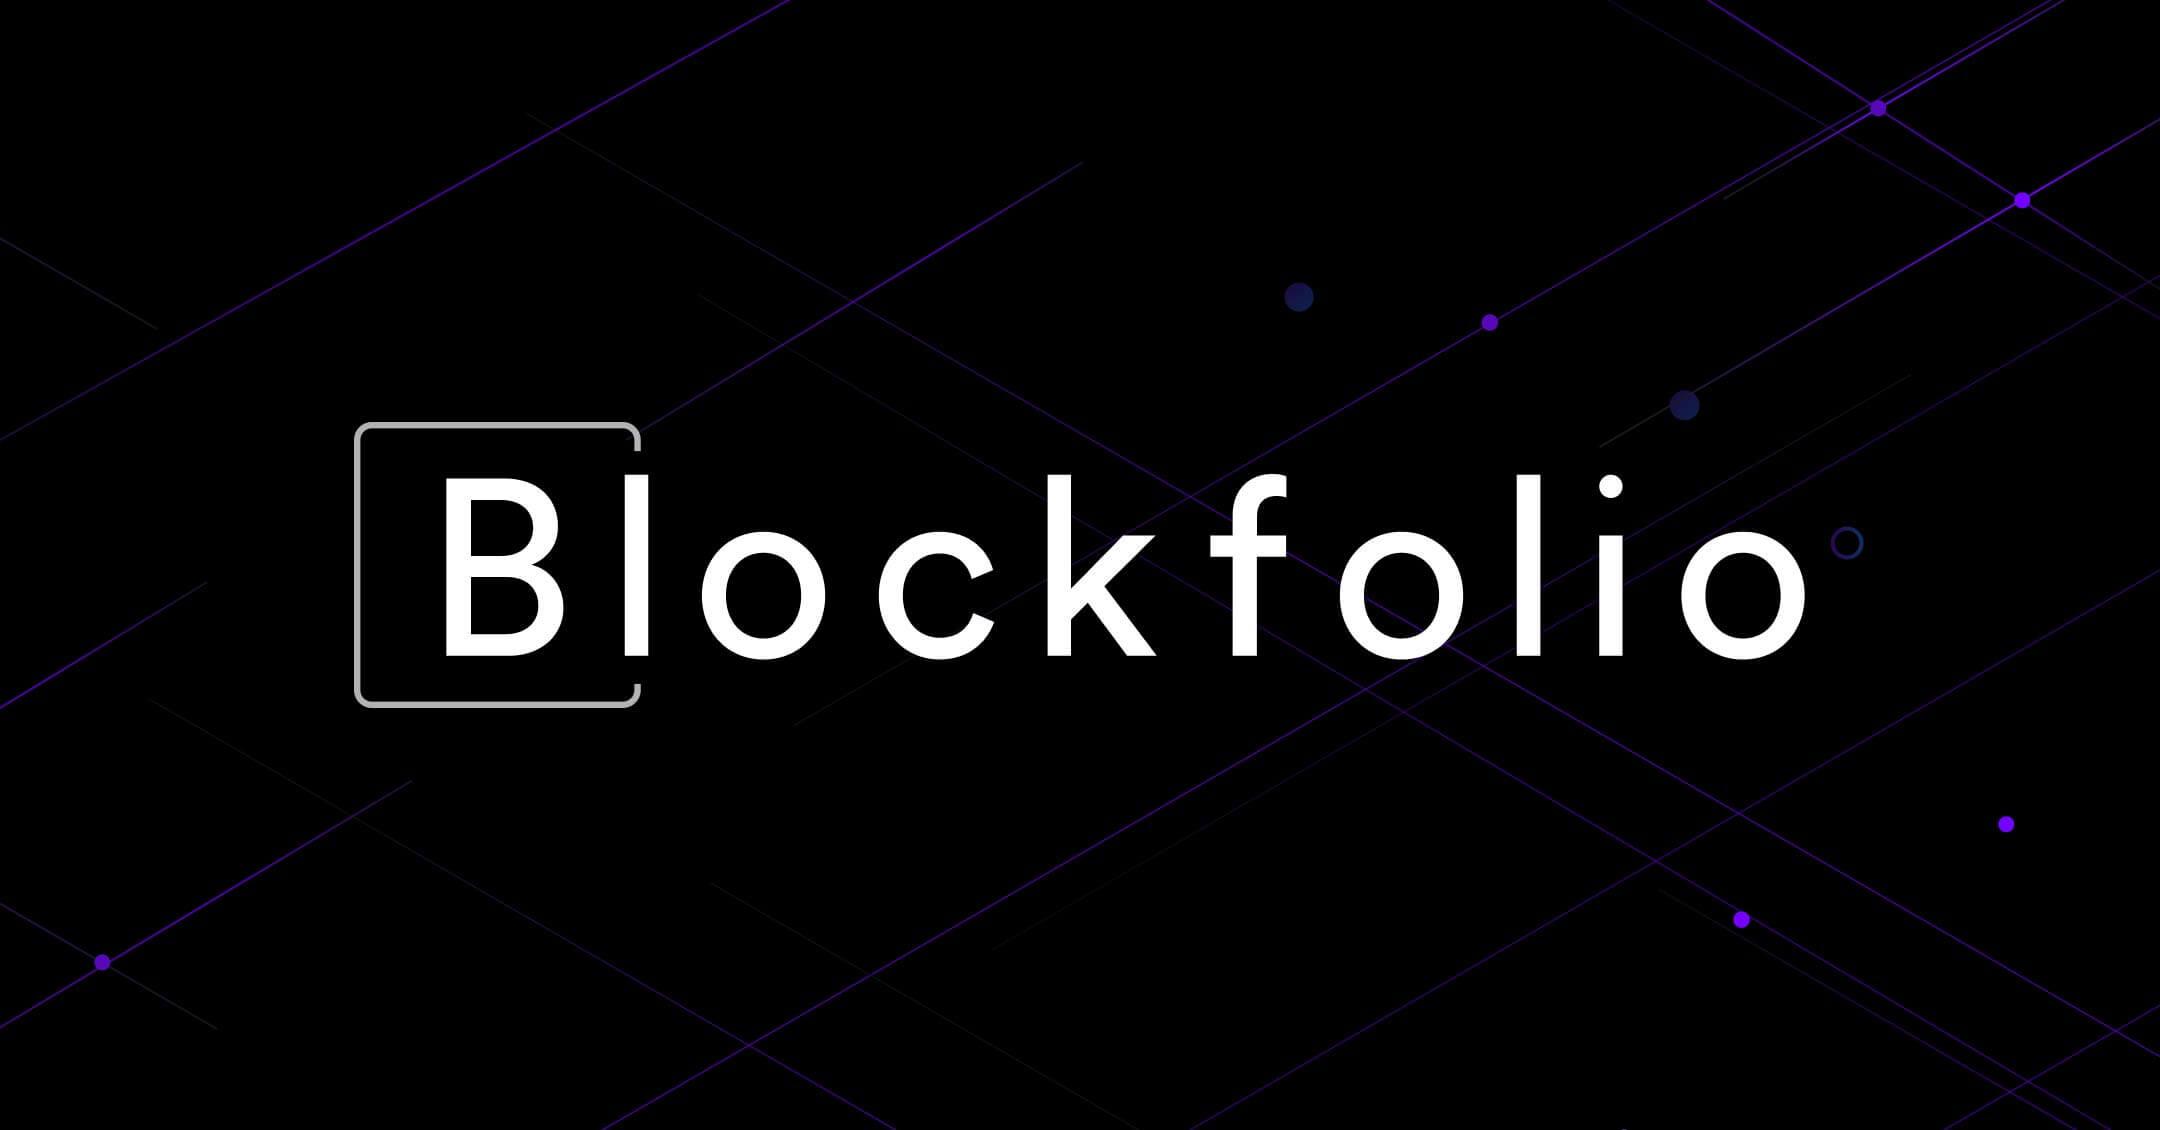 ockfolio crypto portfolio price tracker